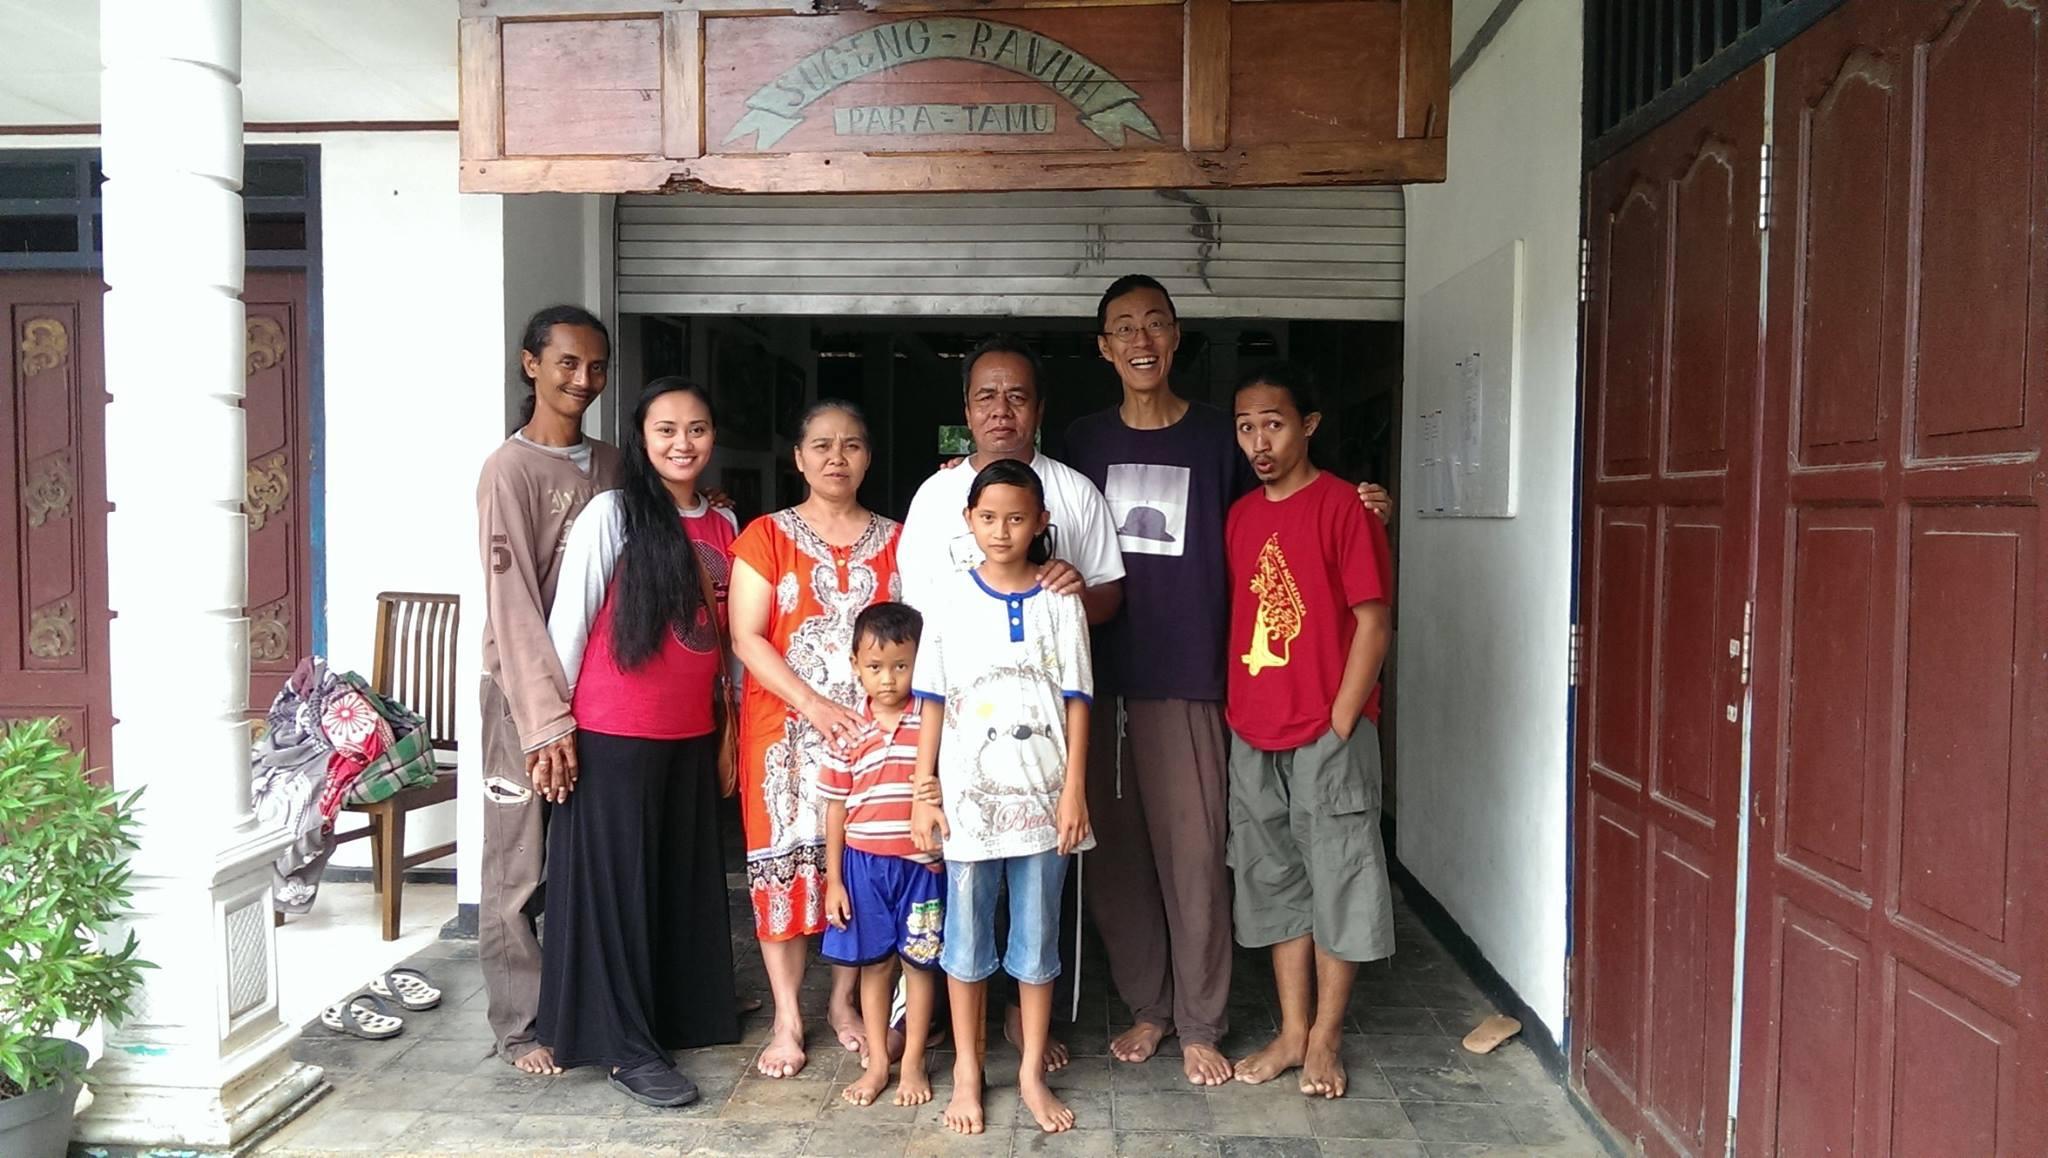 Agung Gunawan and Deaslina da Ary with their family in Pelem